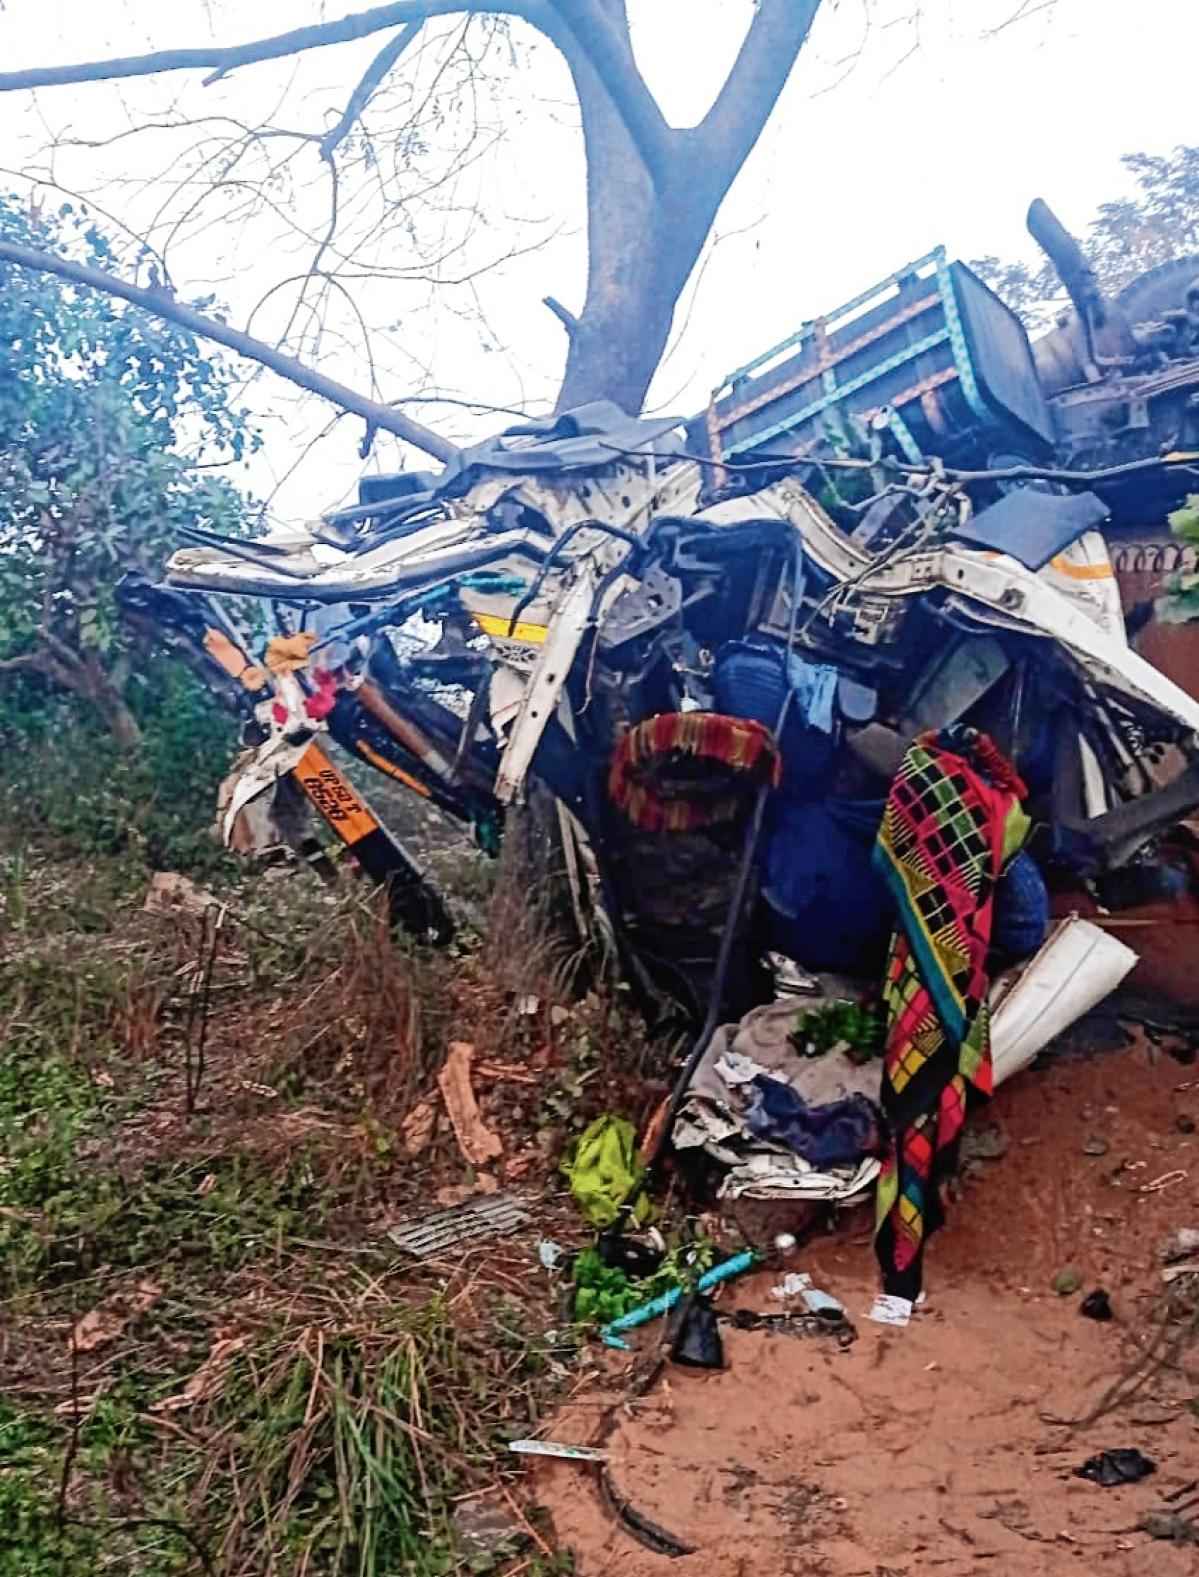 14 Andhra Pradesh pilgrims killed in road accident